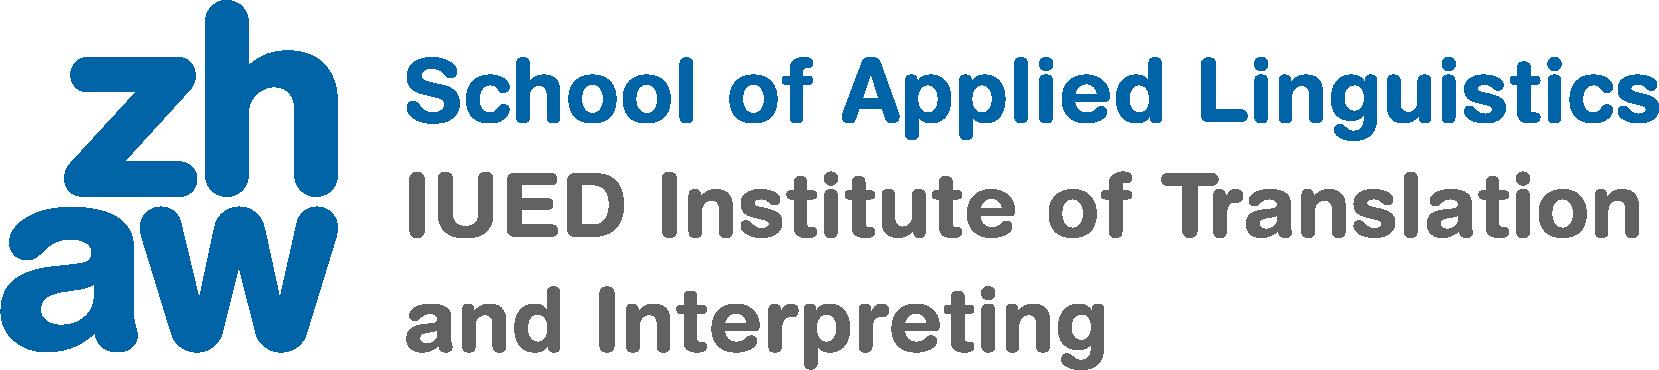 Memsource customer success story Zurich University of Applied Sciences